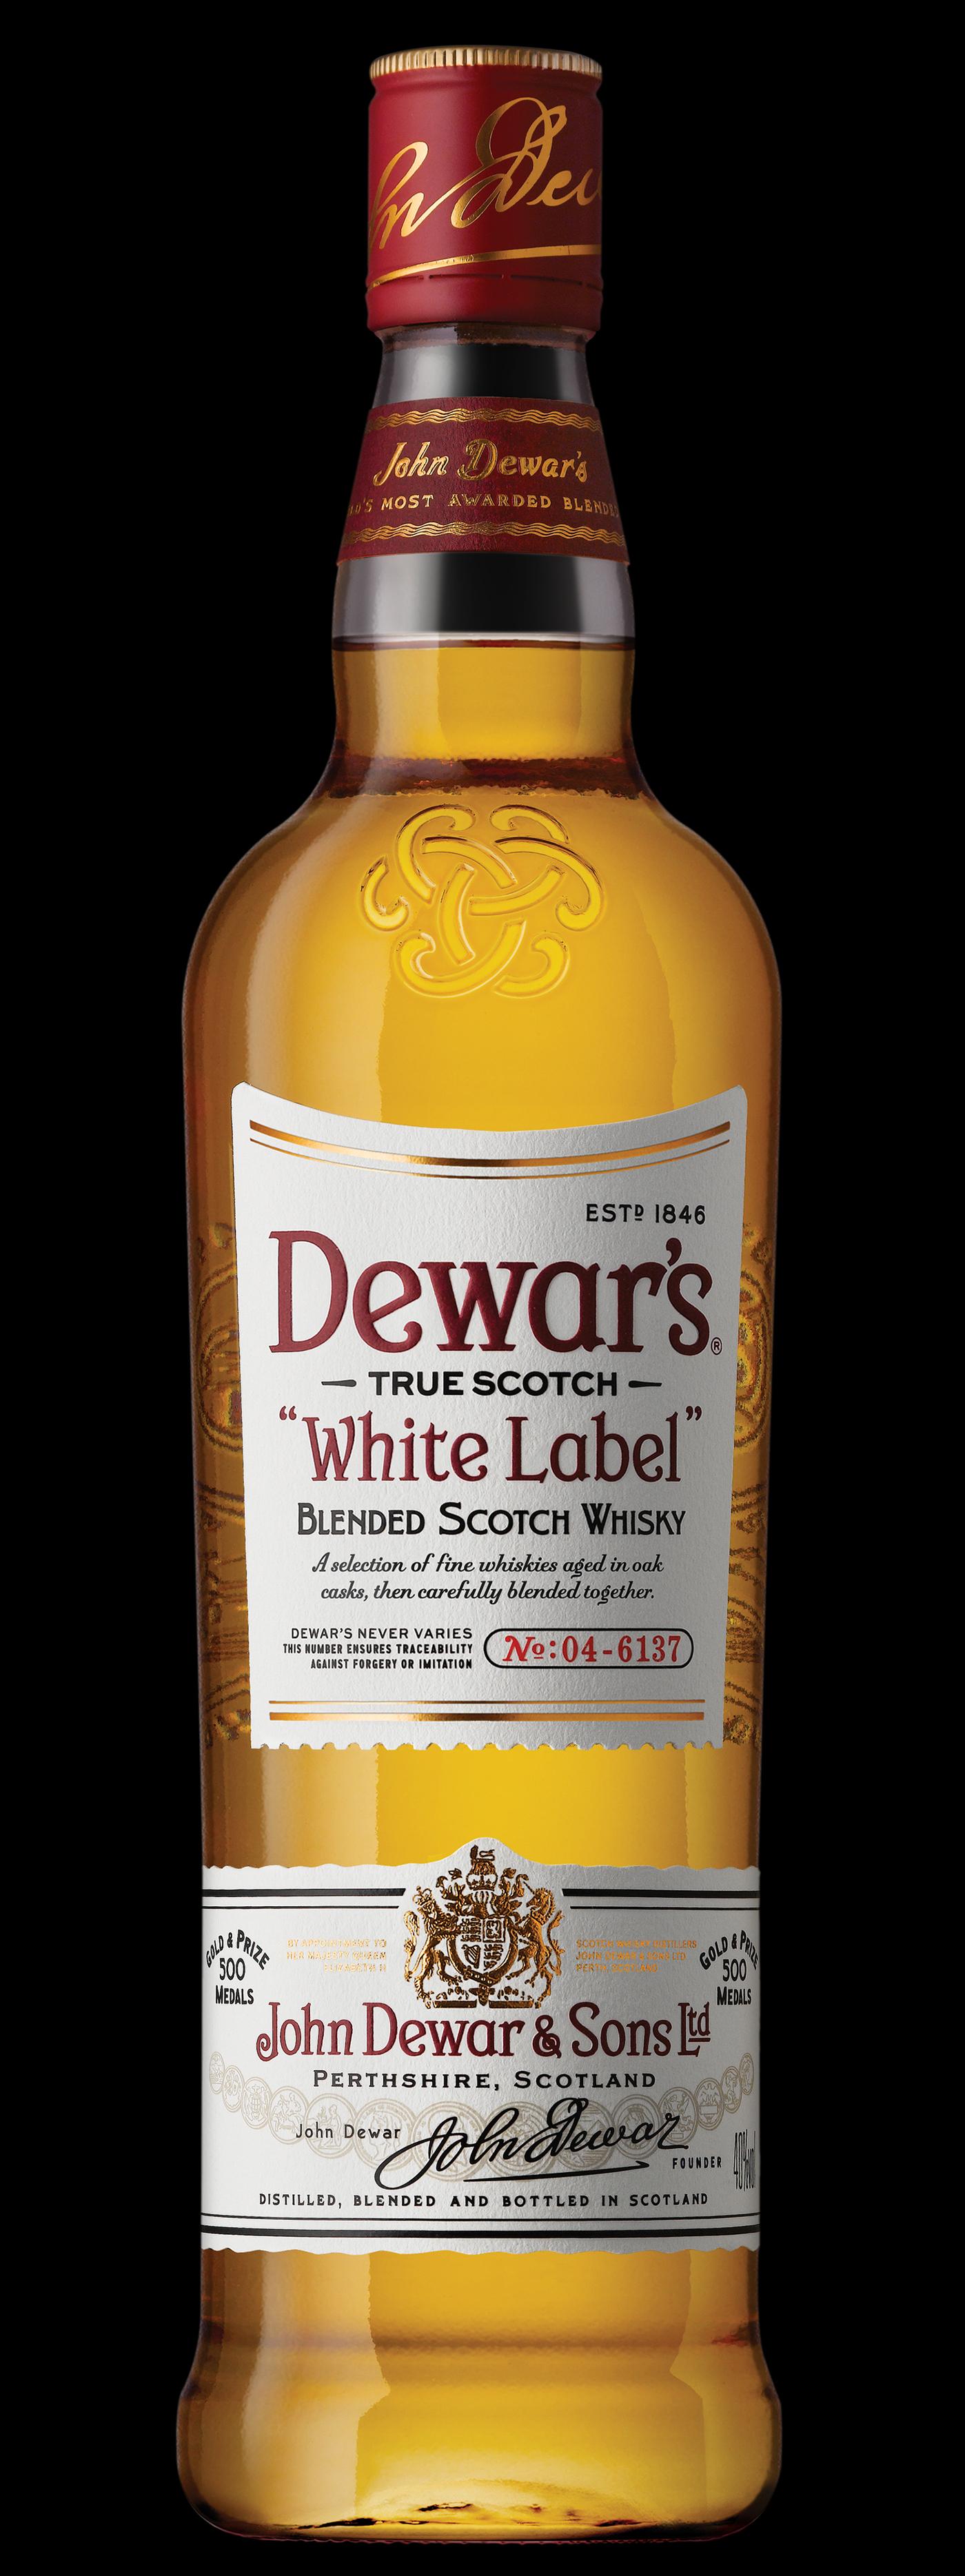 Dewar's Blended Scotch Whisky on Behance1400 x 3738 jpeg 2010kB